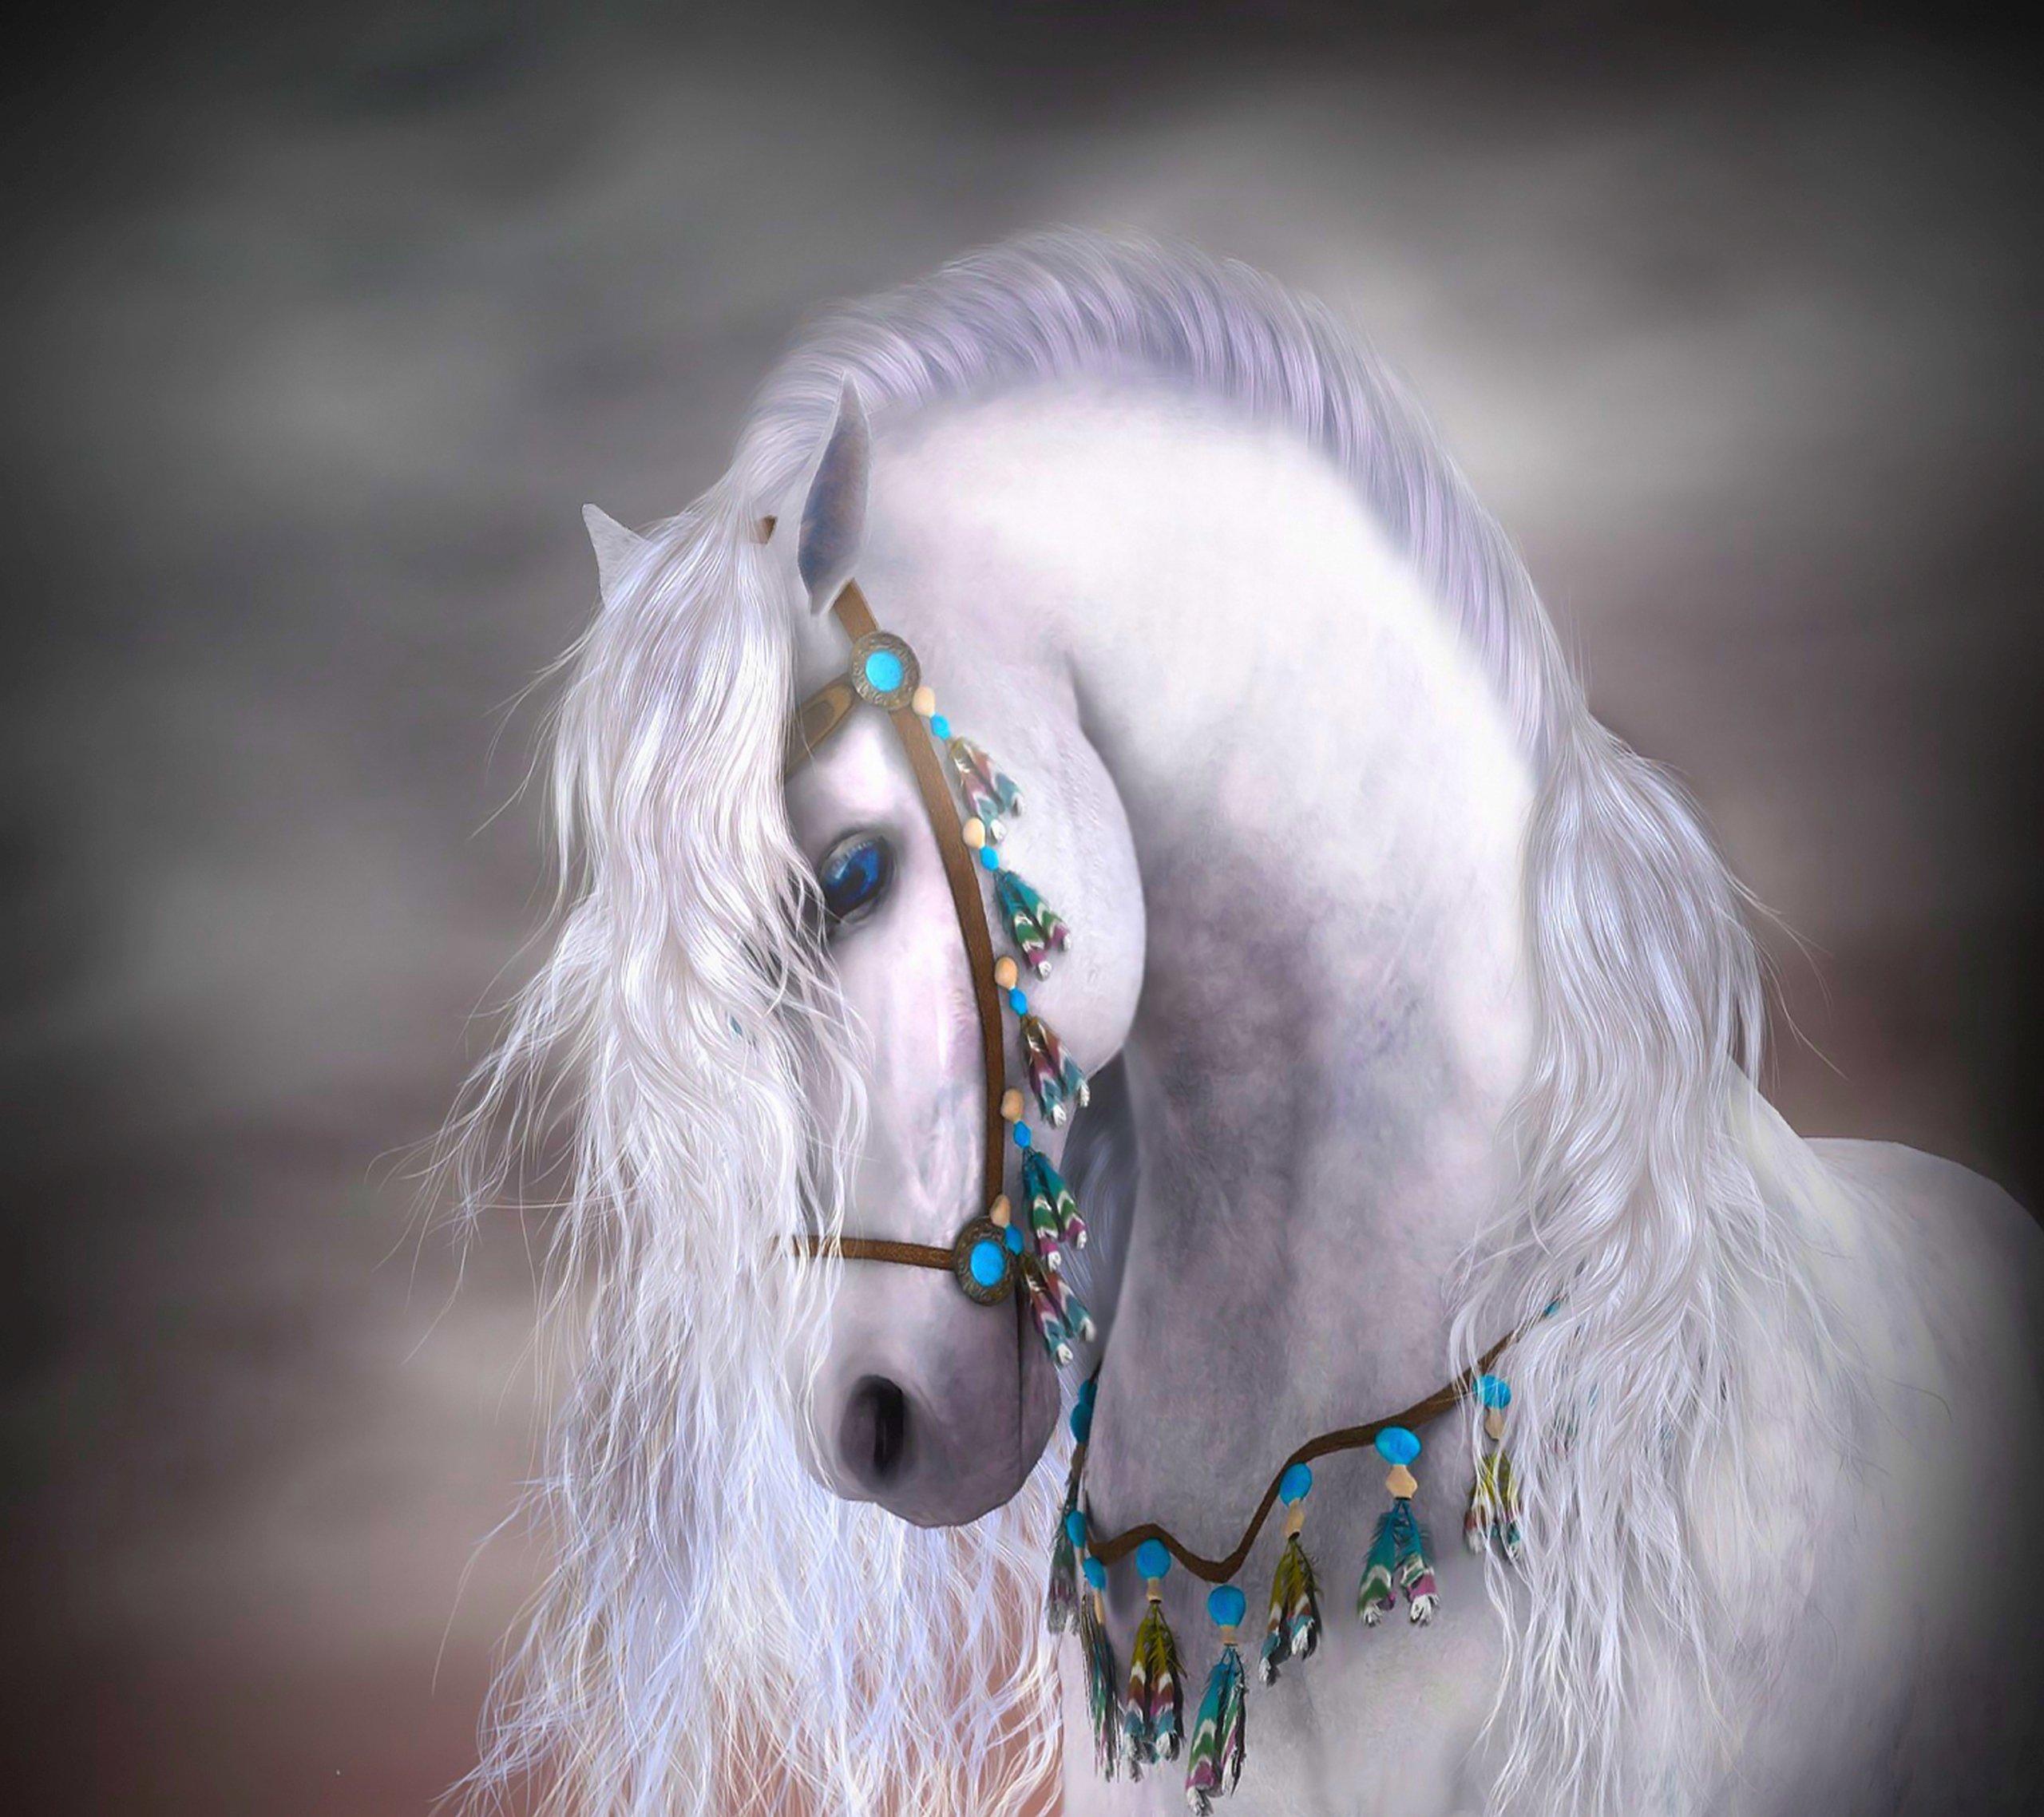 Horses fast art wallpaper running desktop draft horse ...